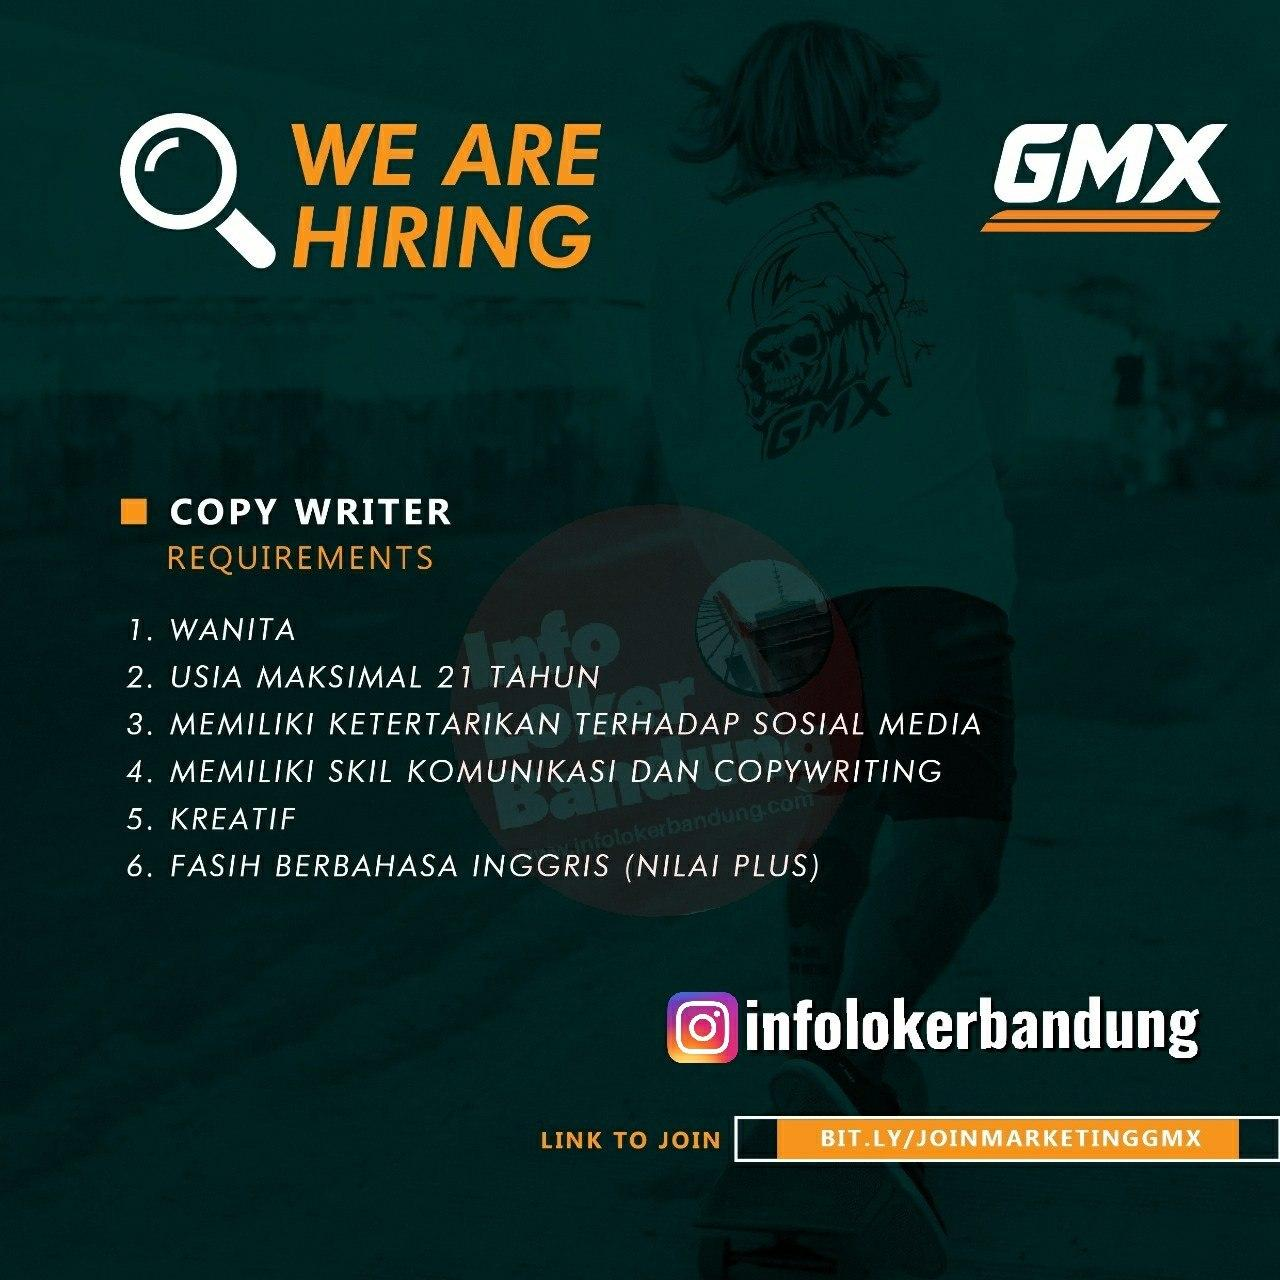 Lowongan Kerja Copy Writer Gmx Bandung Maret 2020